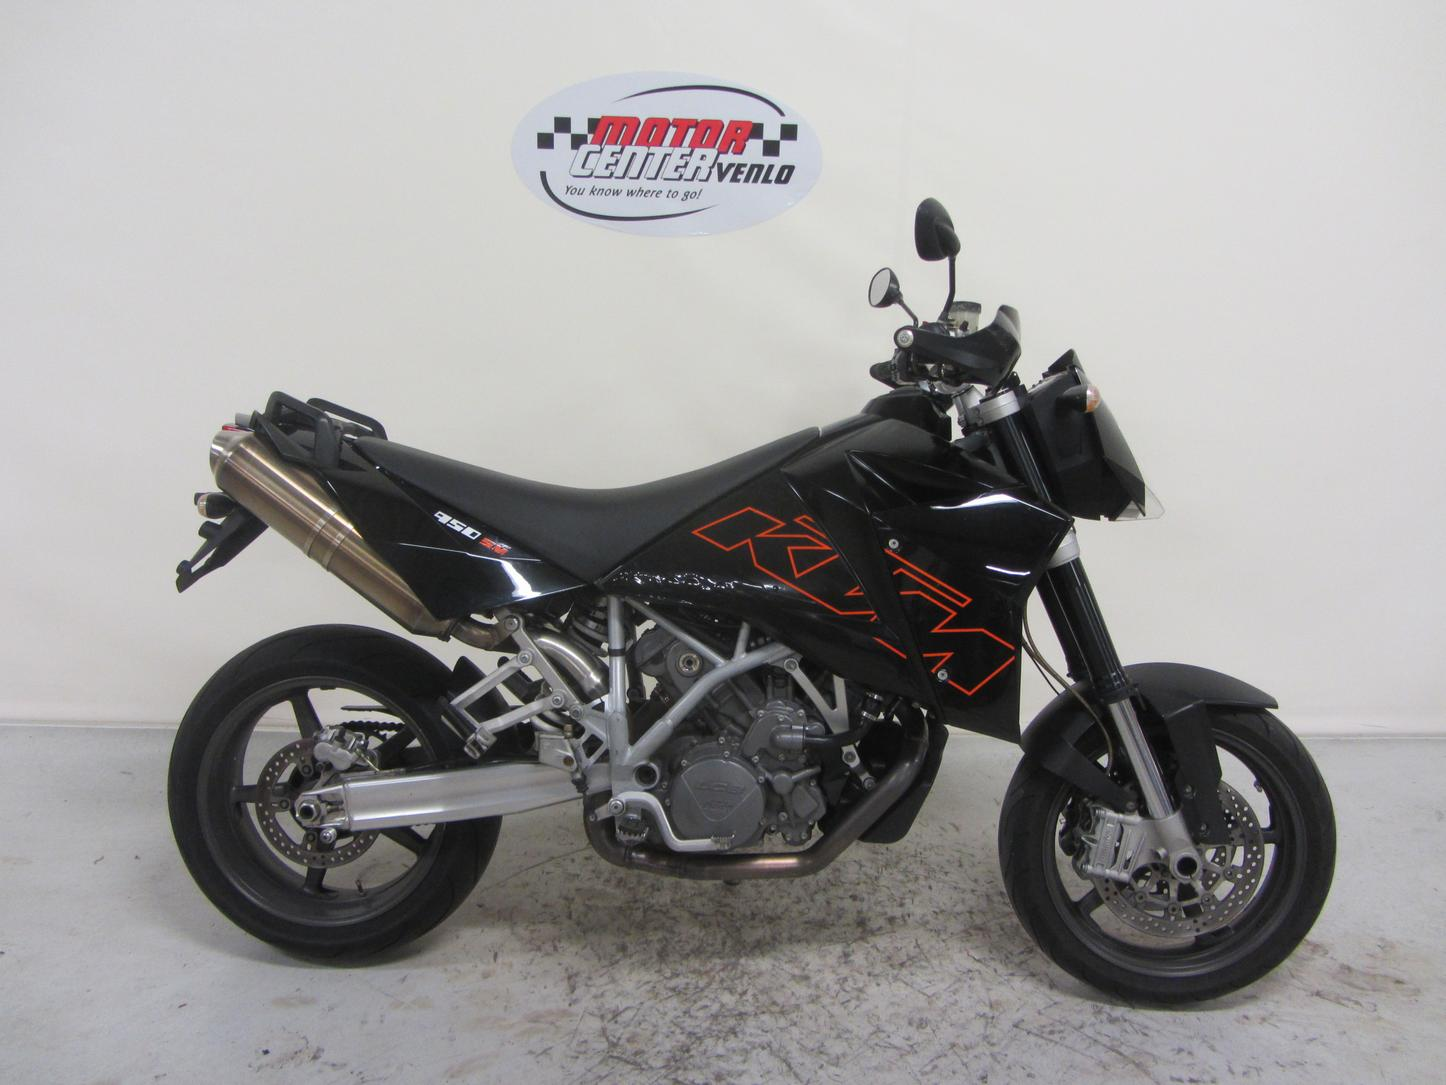 KTM - 950 SUPERMOTO